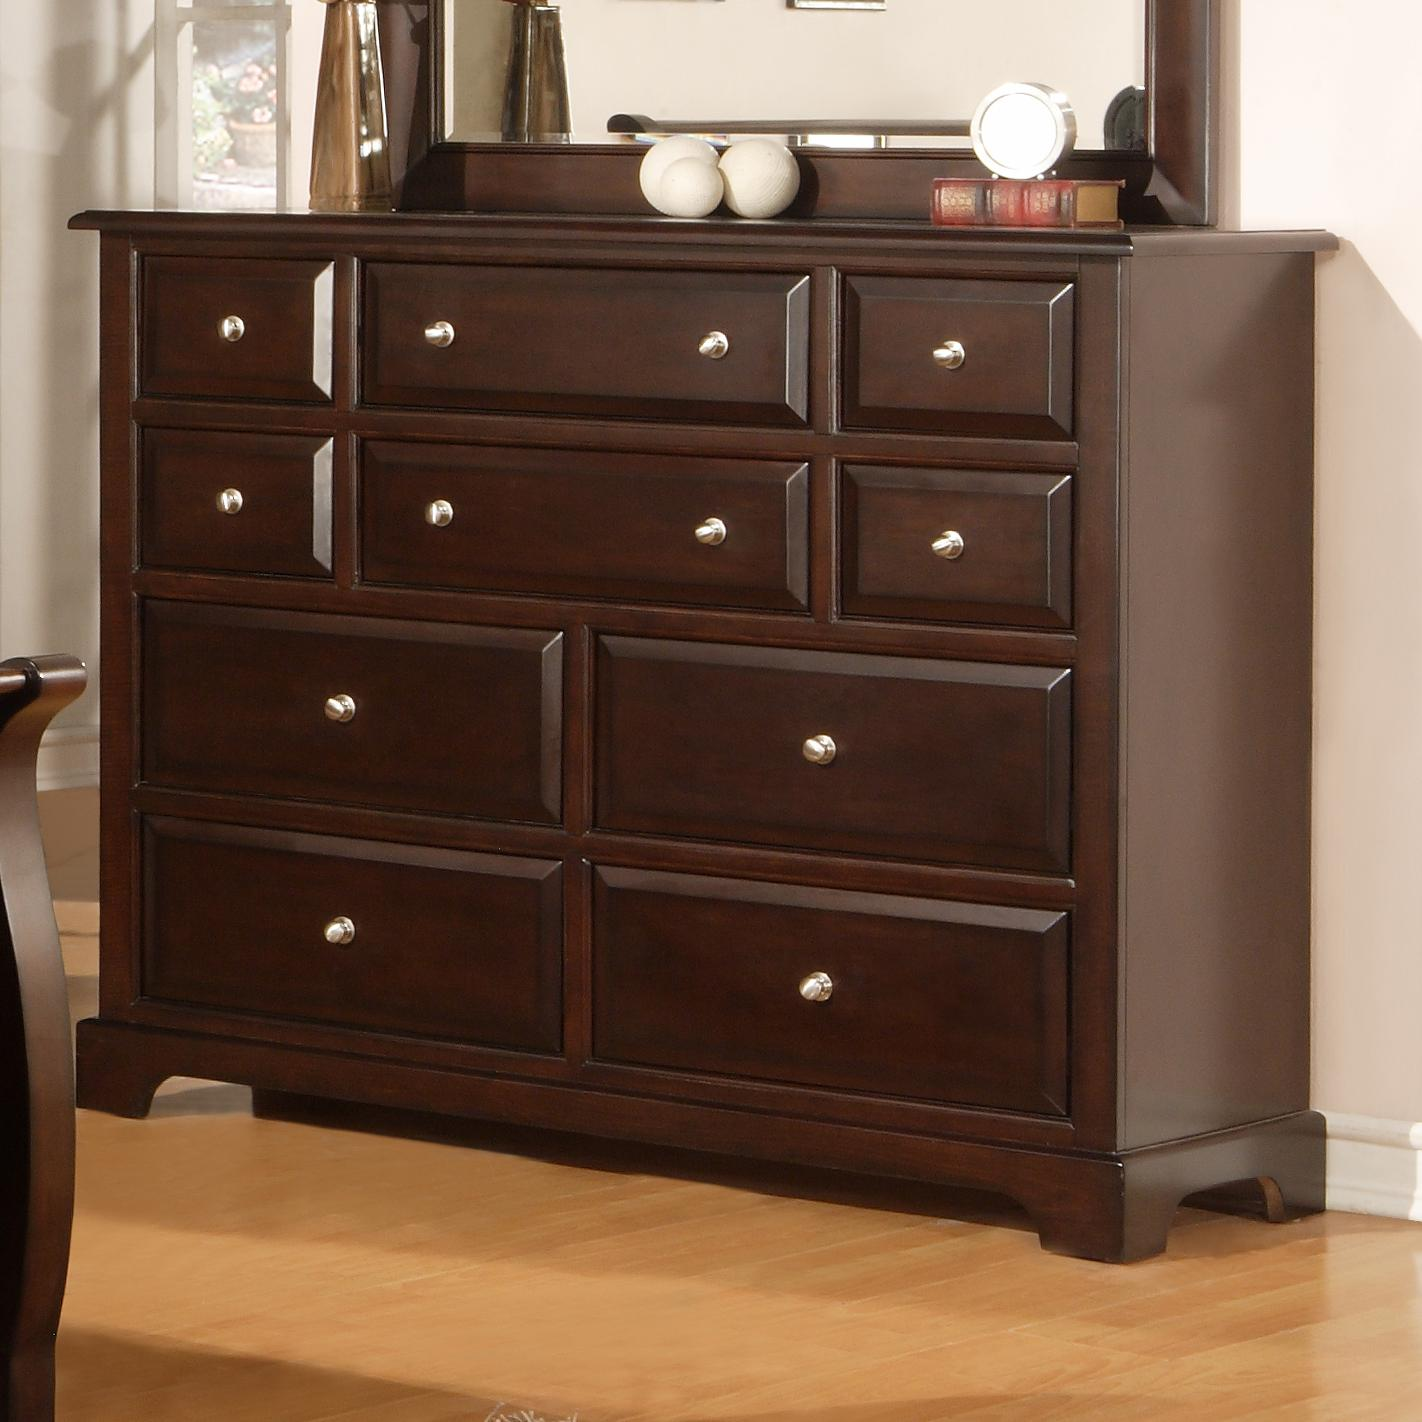 Private Reserve B121 10-Drawer Dresser - Item Number: B121-03